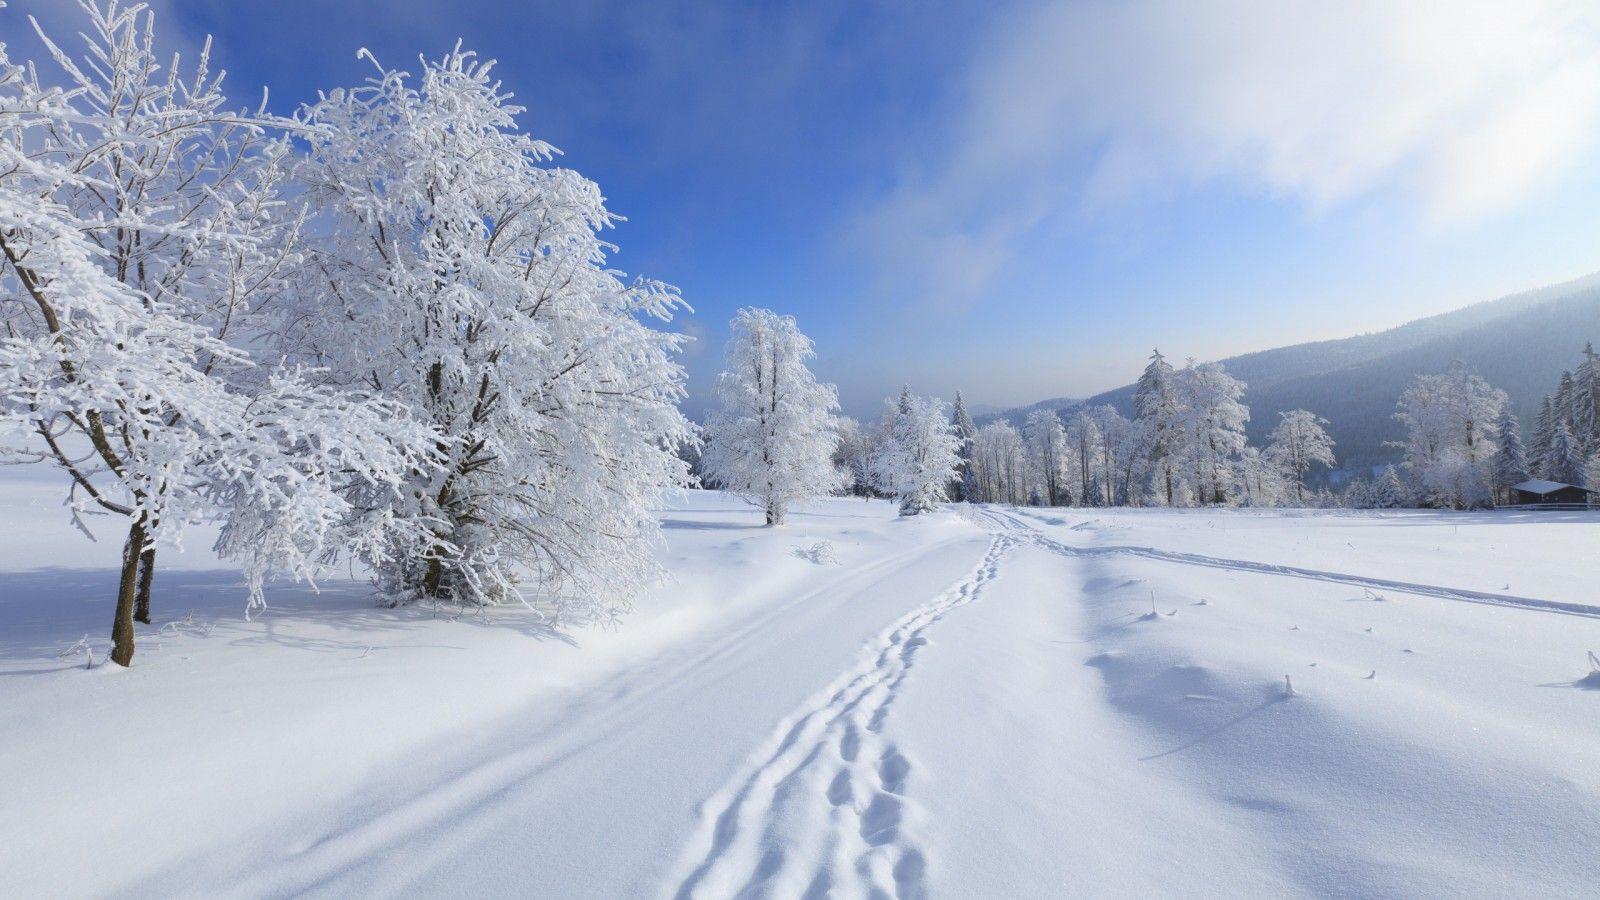 Beautiful Snowfall Season Wallpapers Warm Breath Feelings 1024x1024 Wallpaper Snow 40